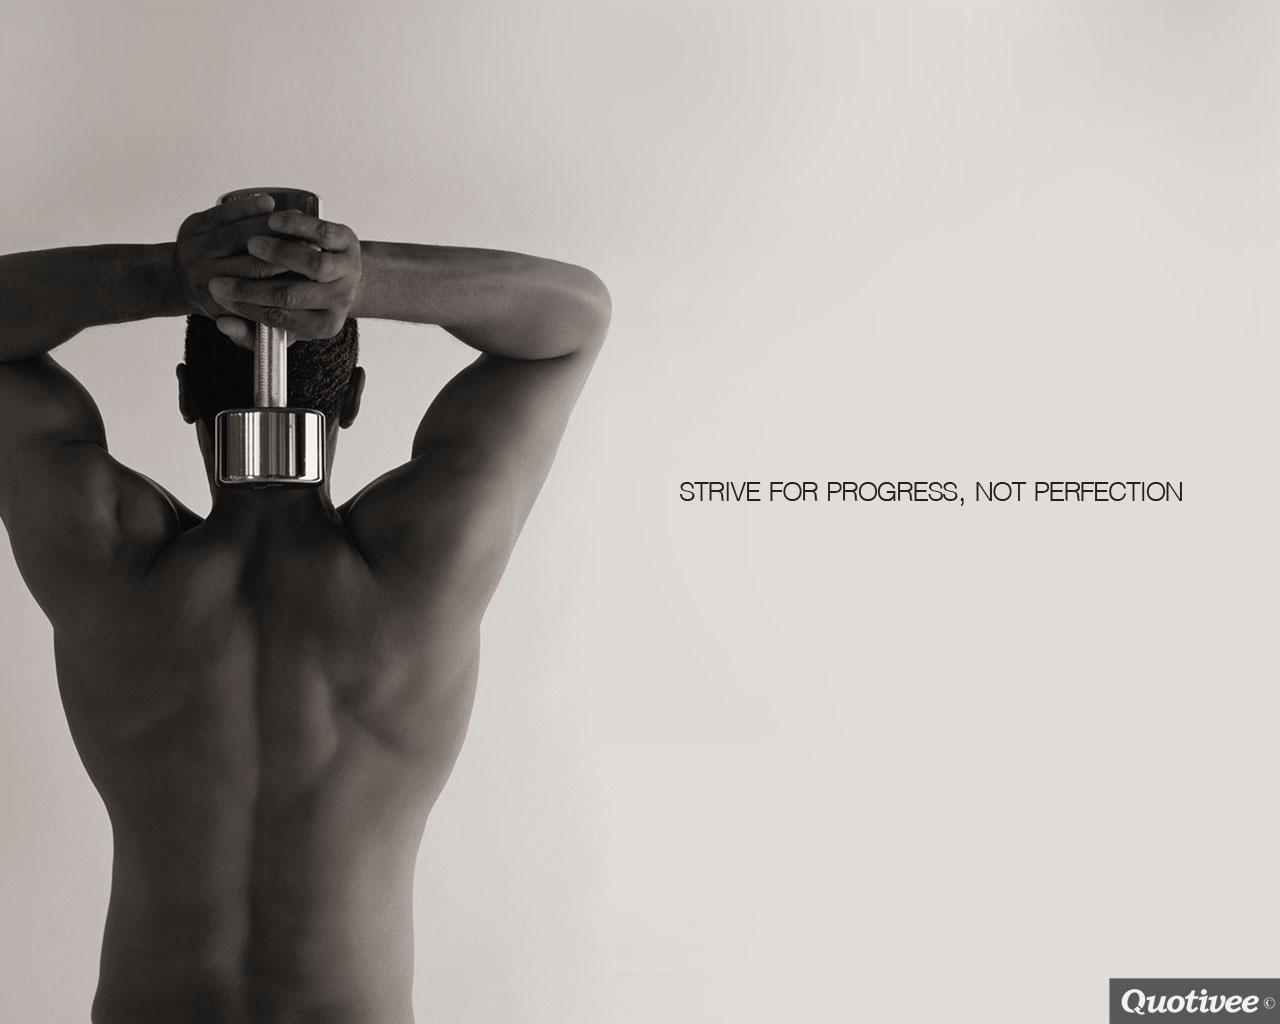 Motivational Wallpaper on Progress: Strive for progress not perfection